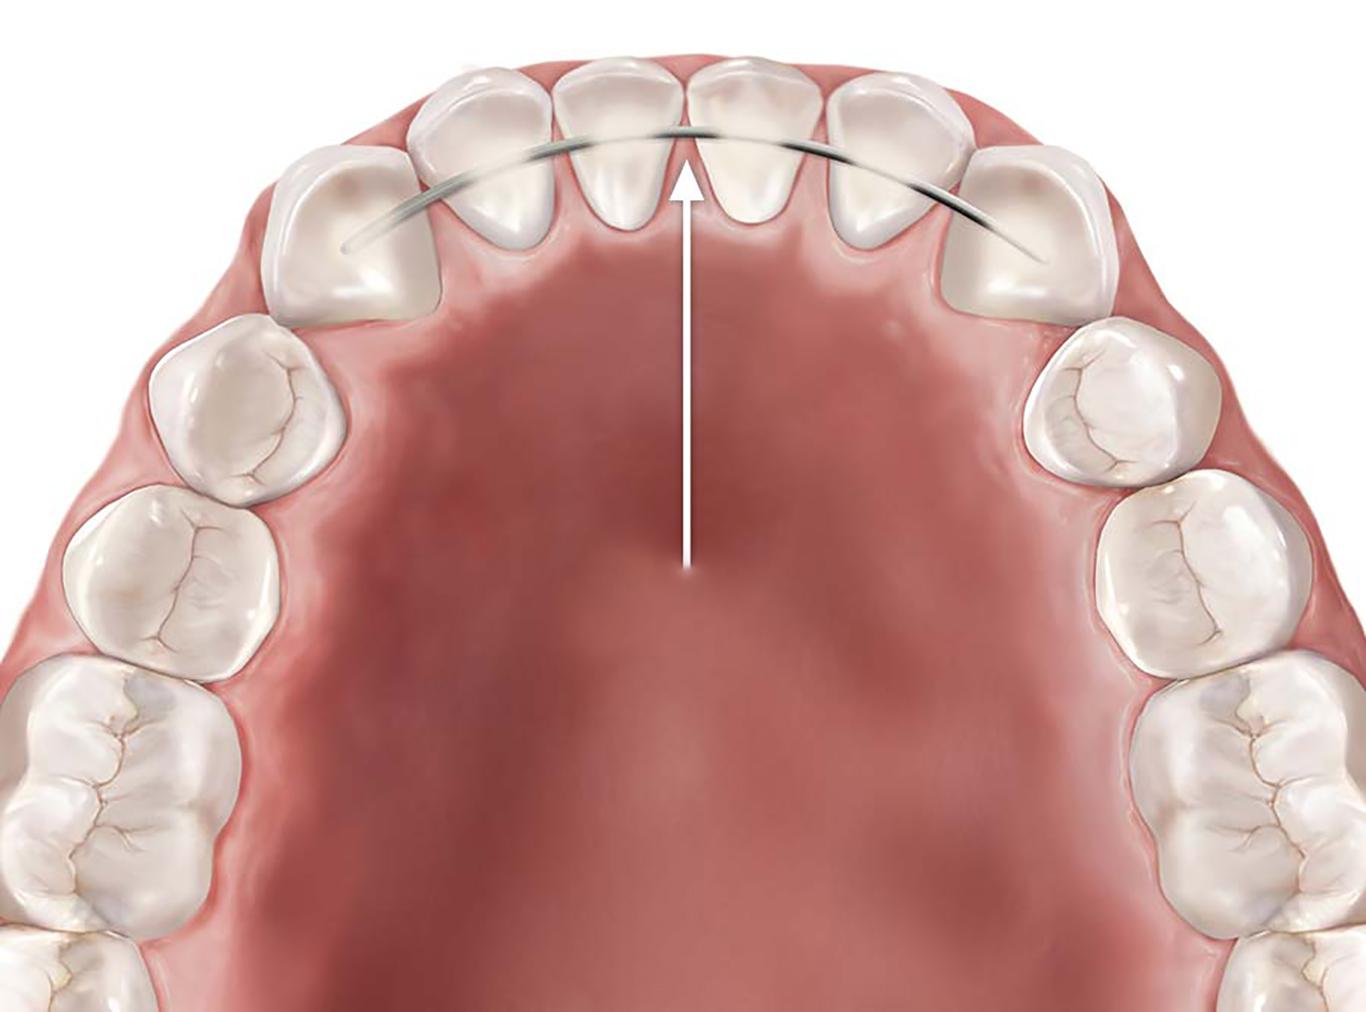 Fixed retainer service of Skopek Orthodontics